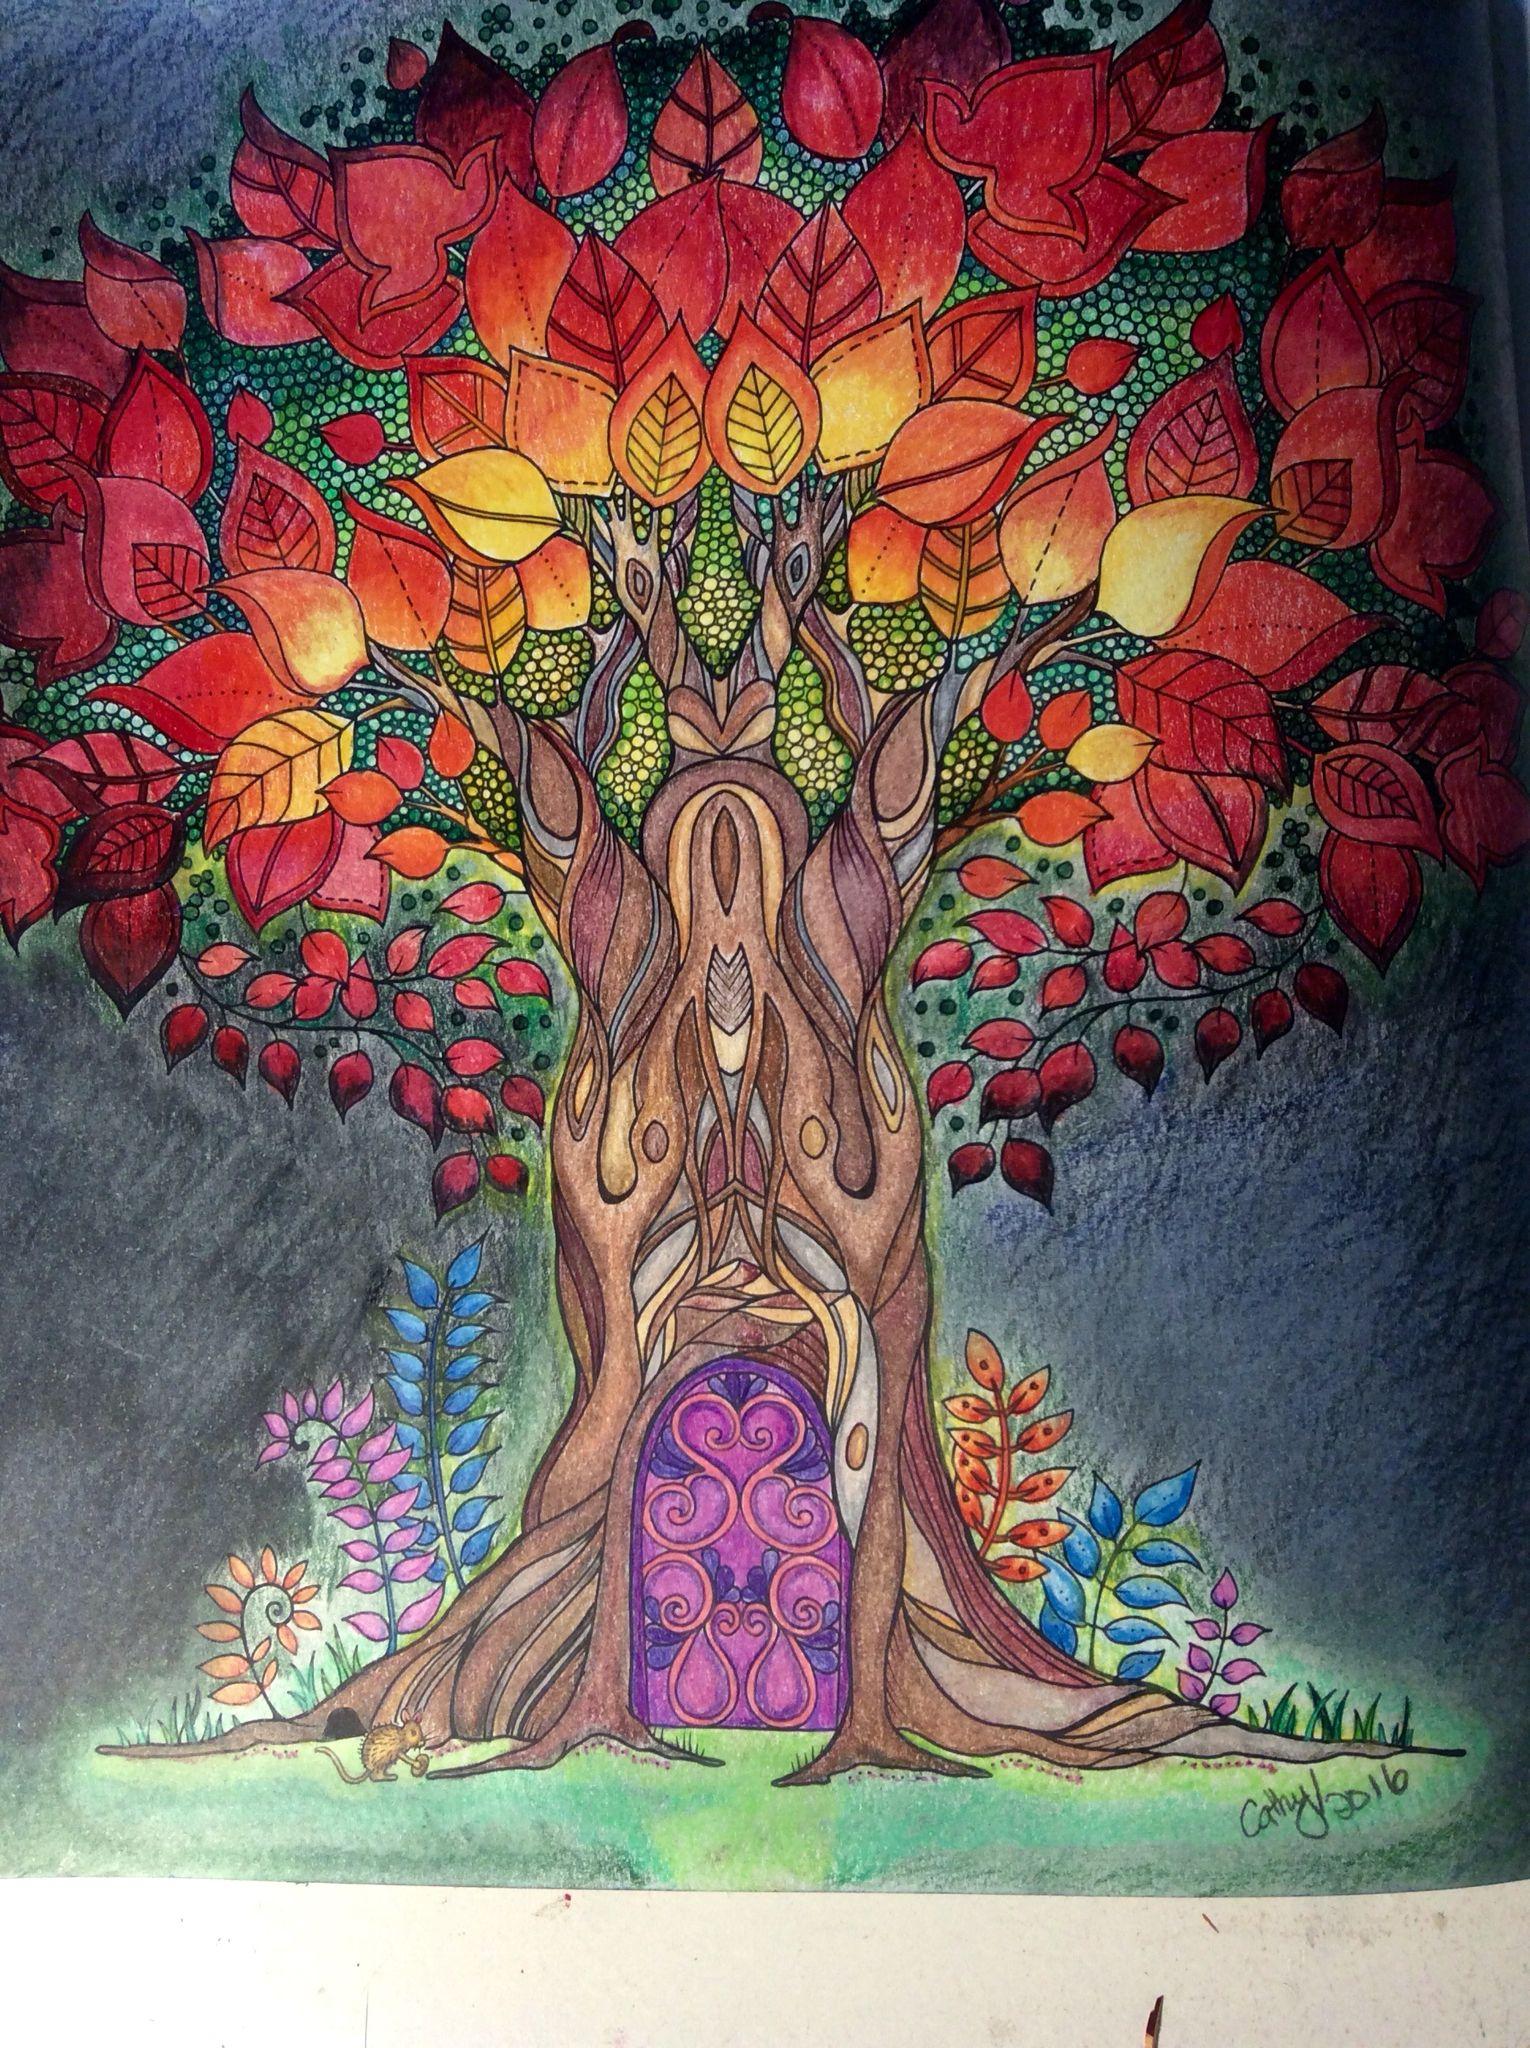 Treehouse Enchanted Forest Johanna Basford Cathyc Pencil Crayons